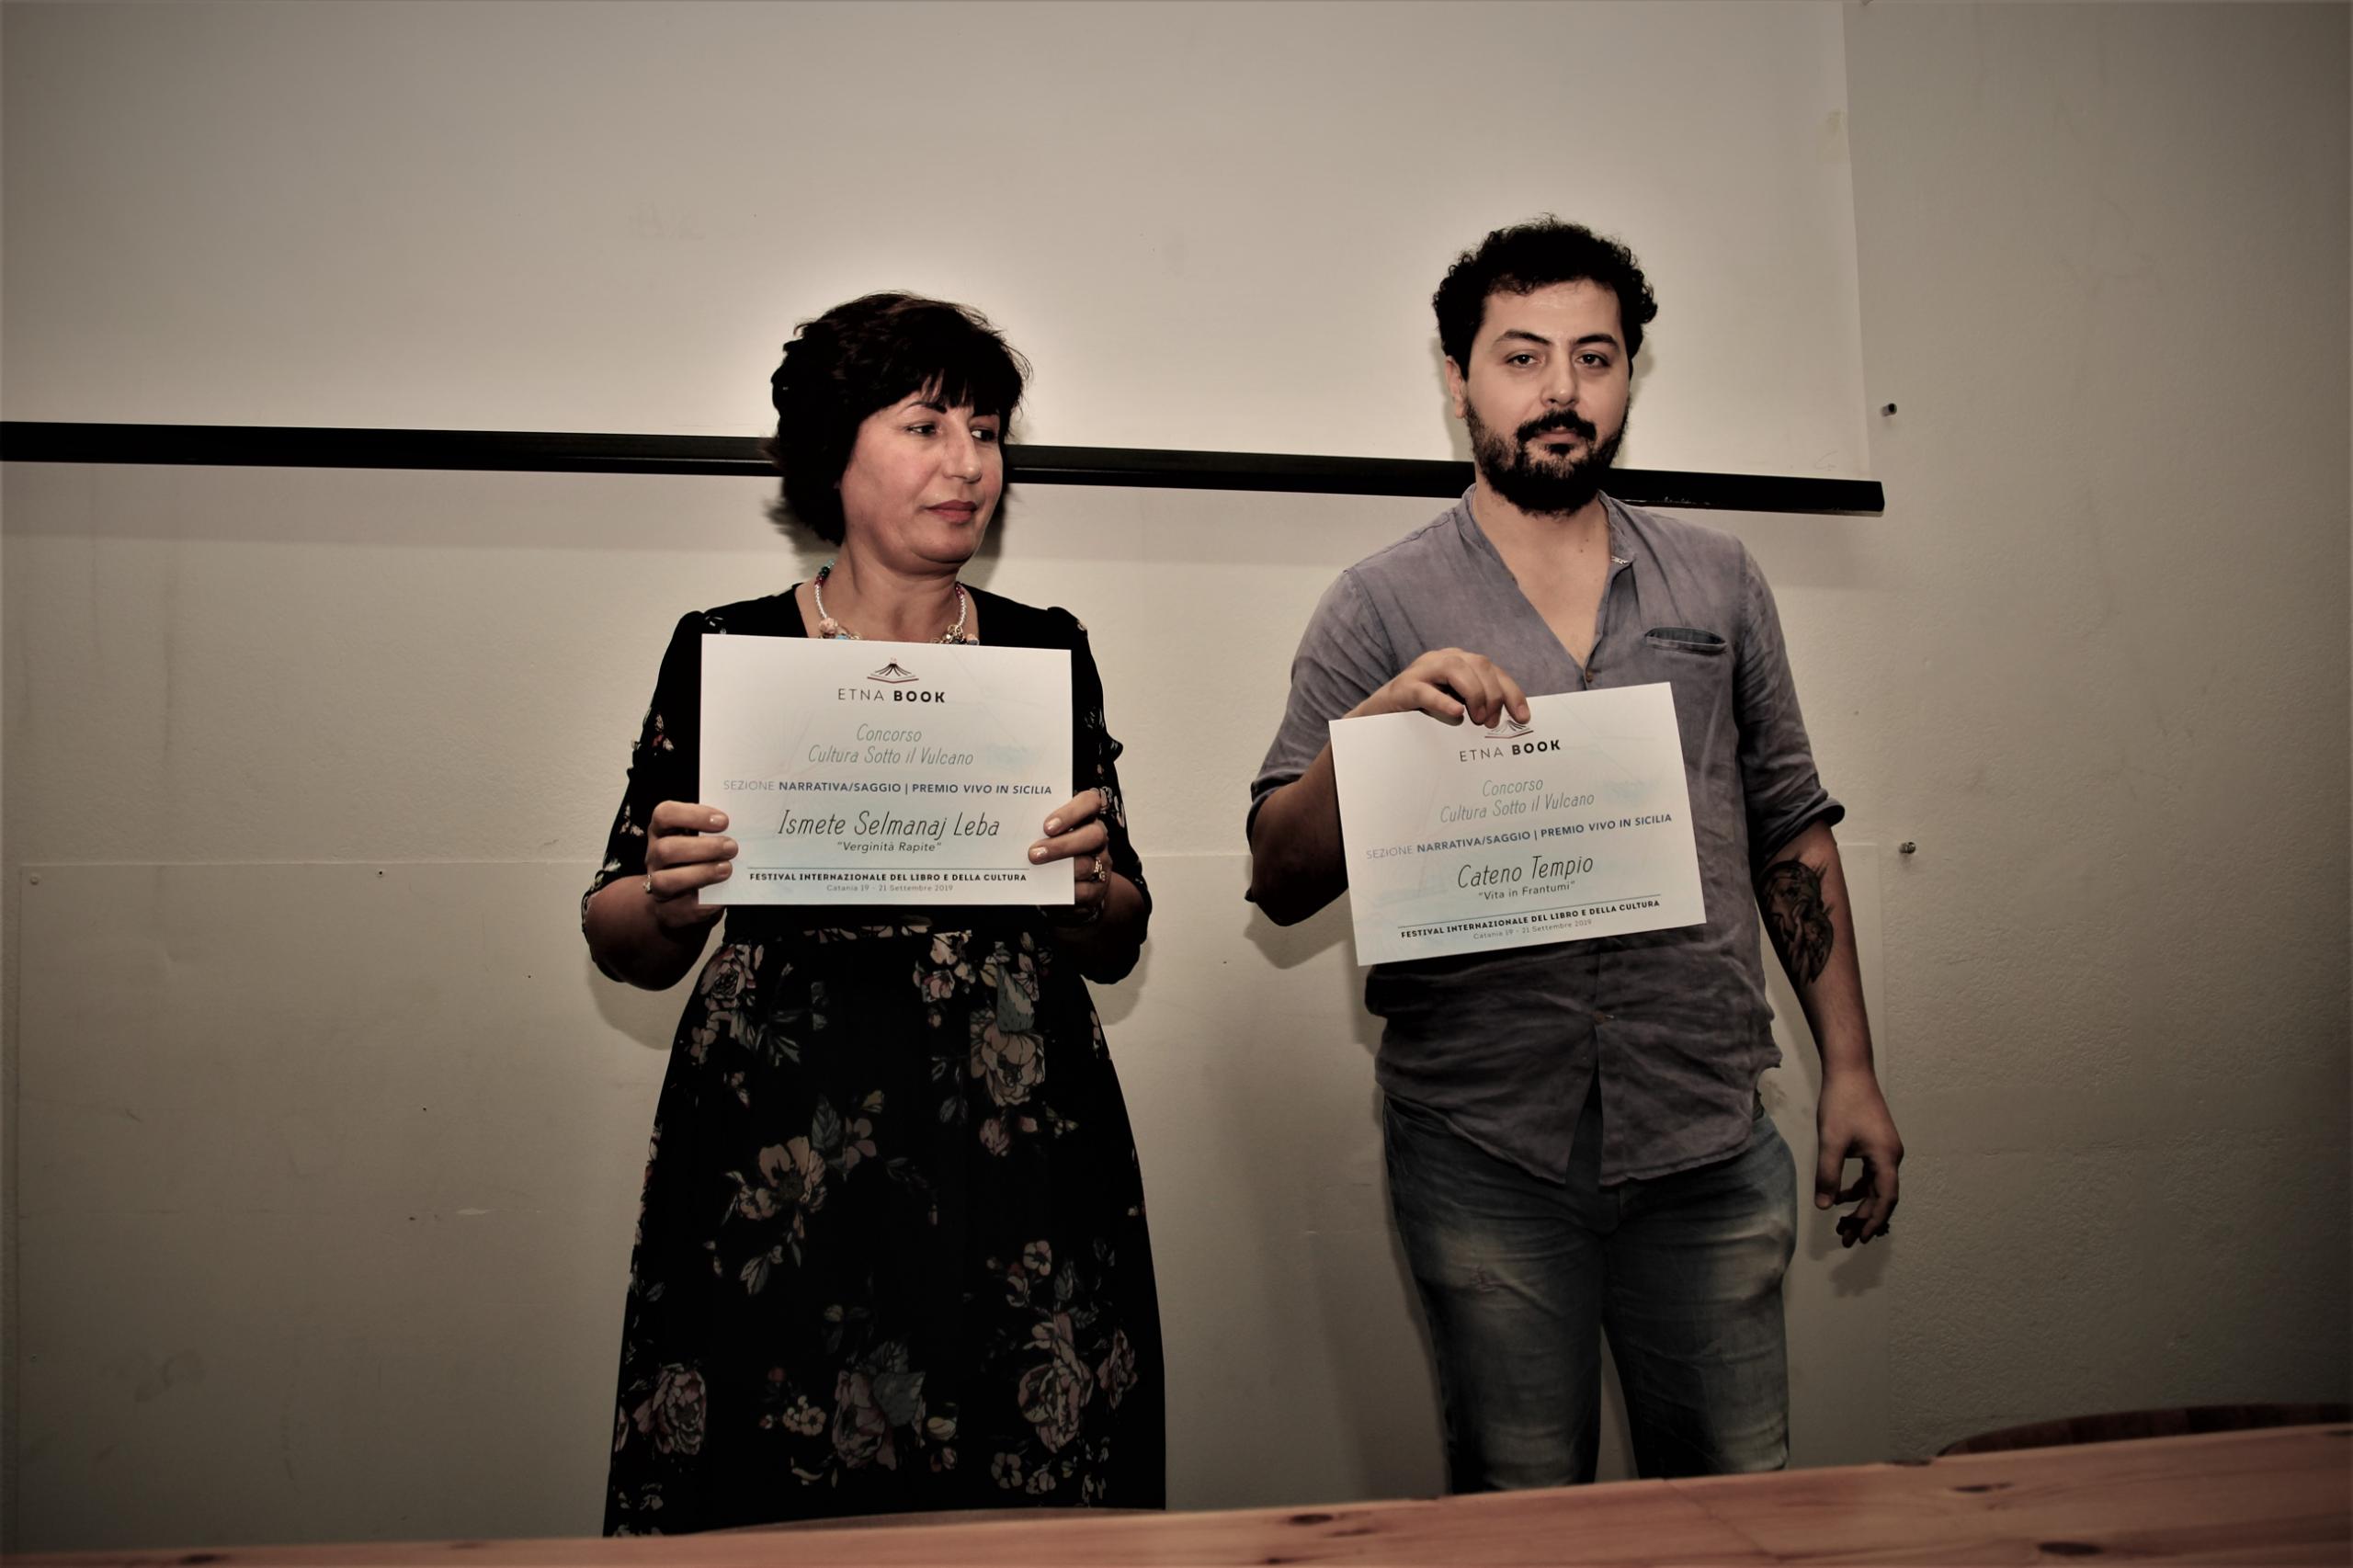 premio-vivo-in-sicilia-1581274957.jpg